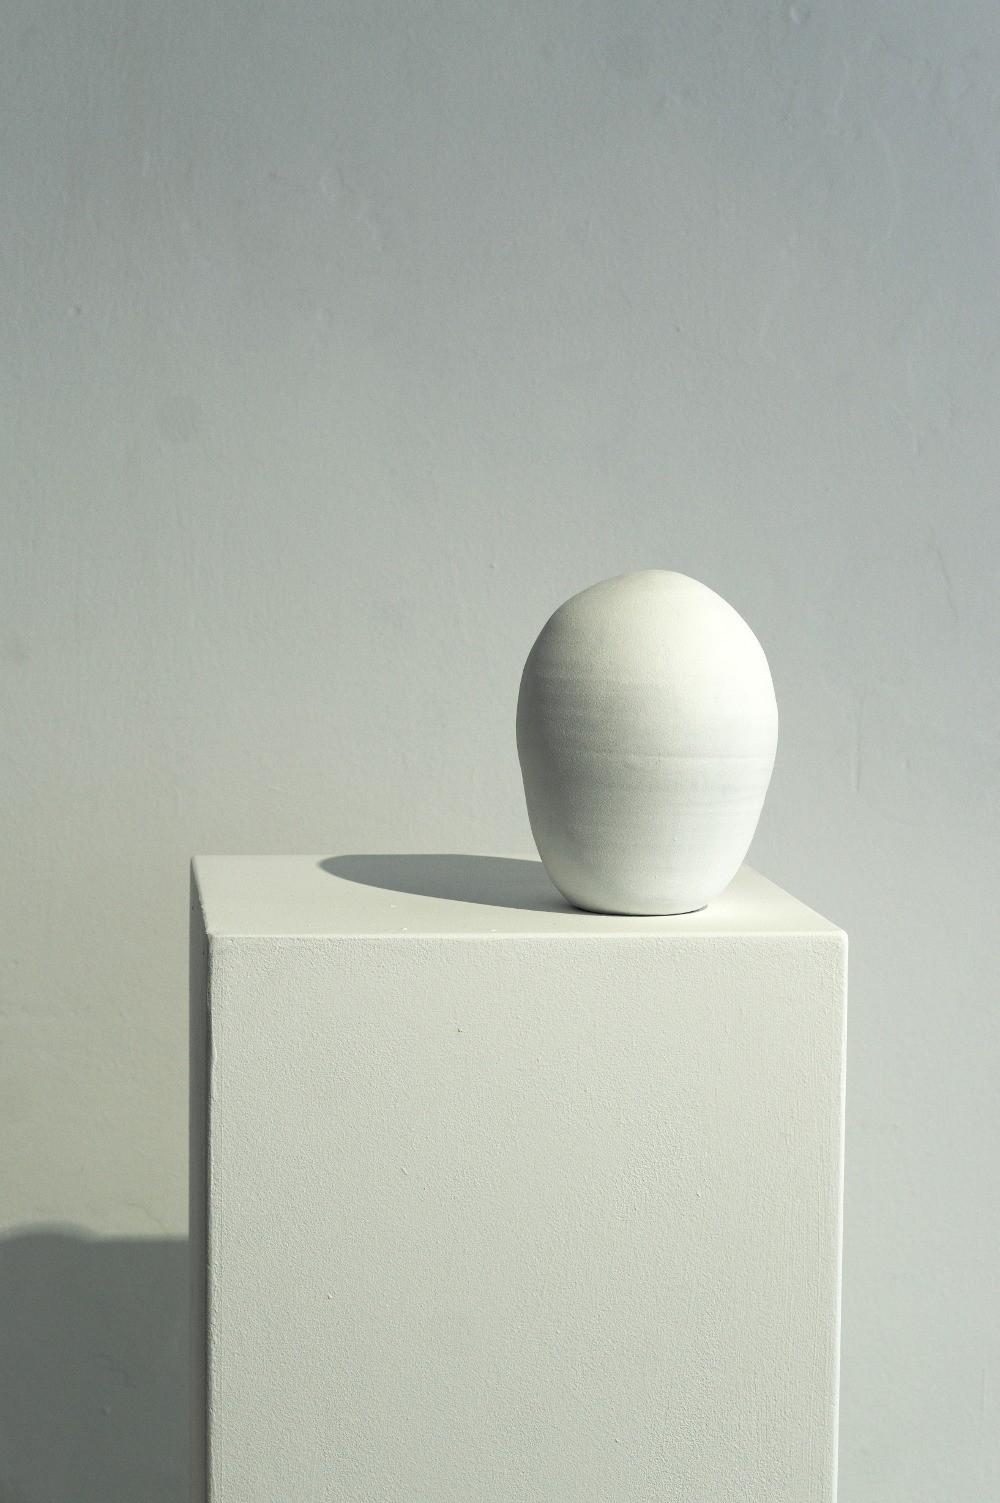 »Eule« / Keramik, Acryl, Sockel / 143,0 x 40,0 x 40,0 cm, 2016